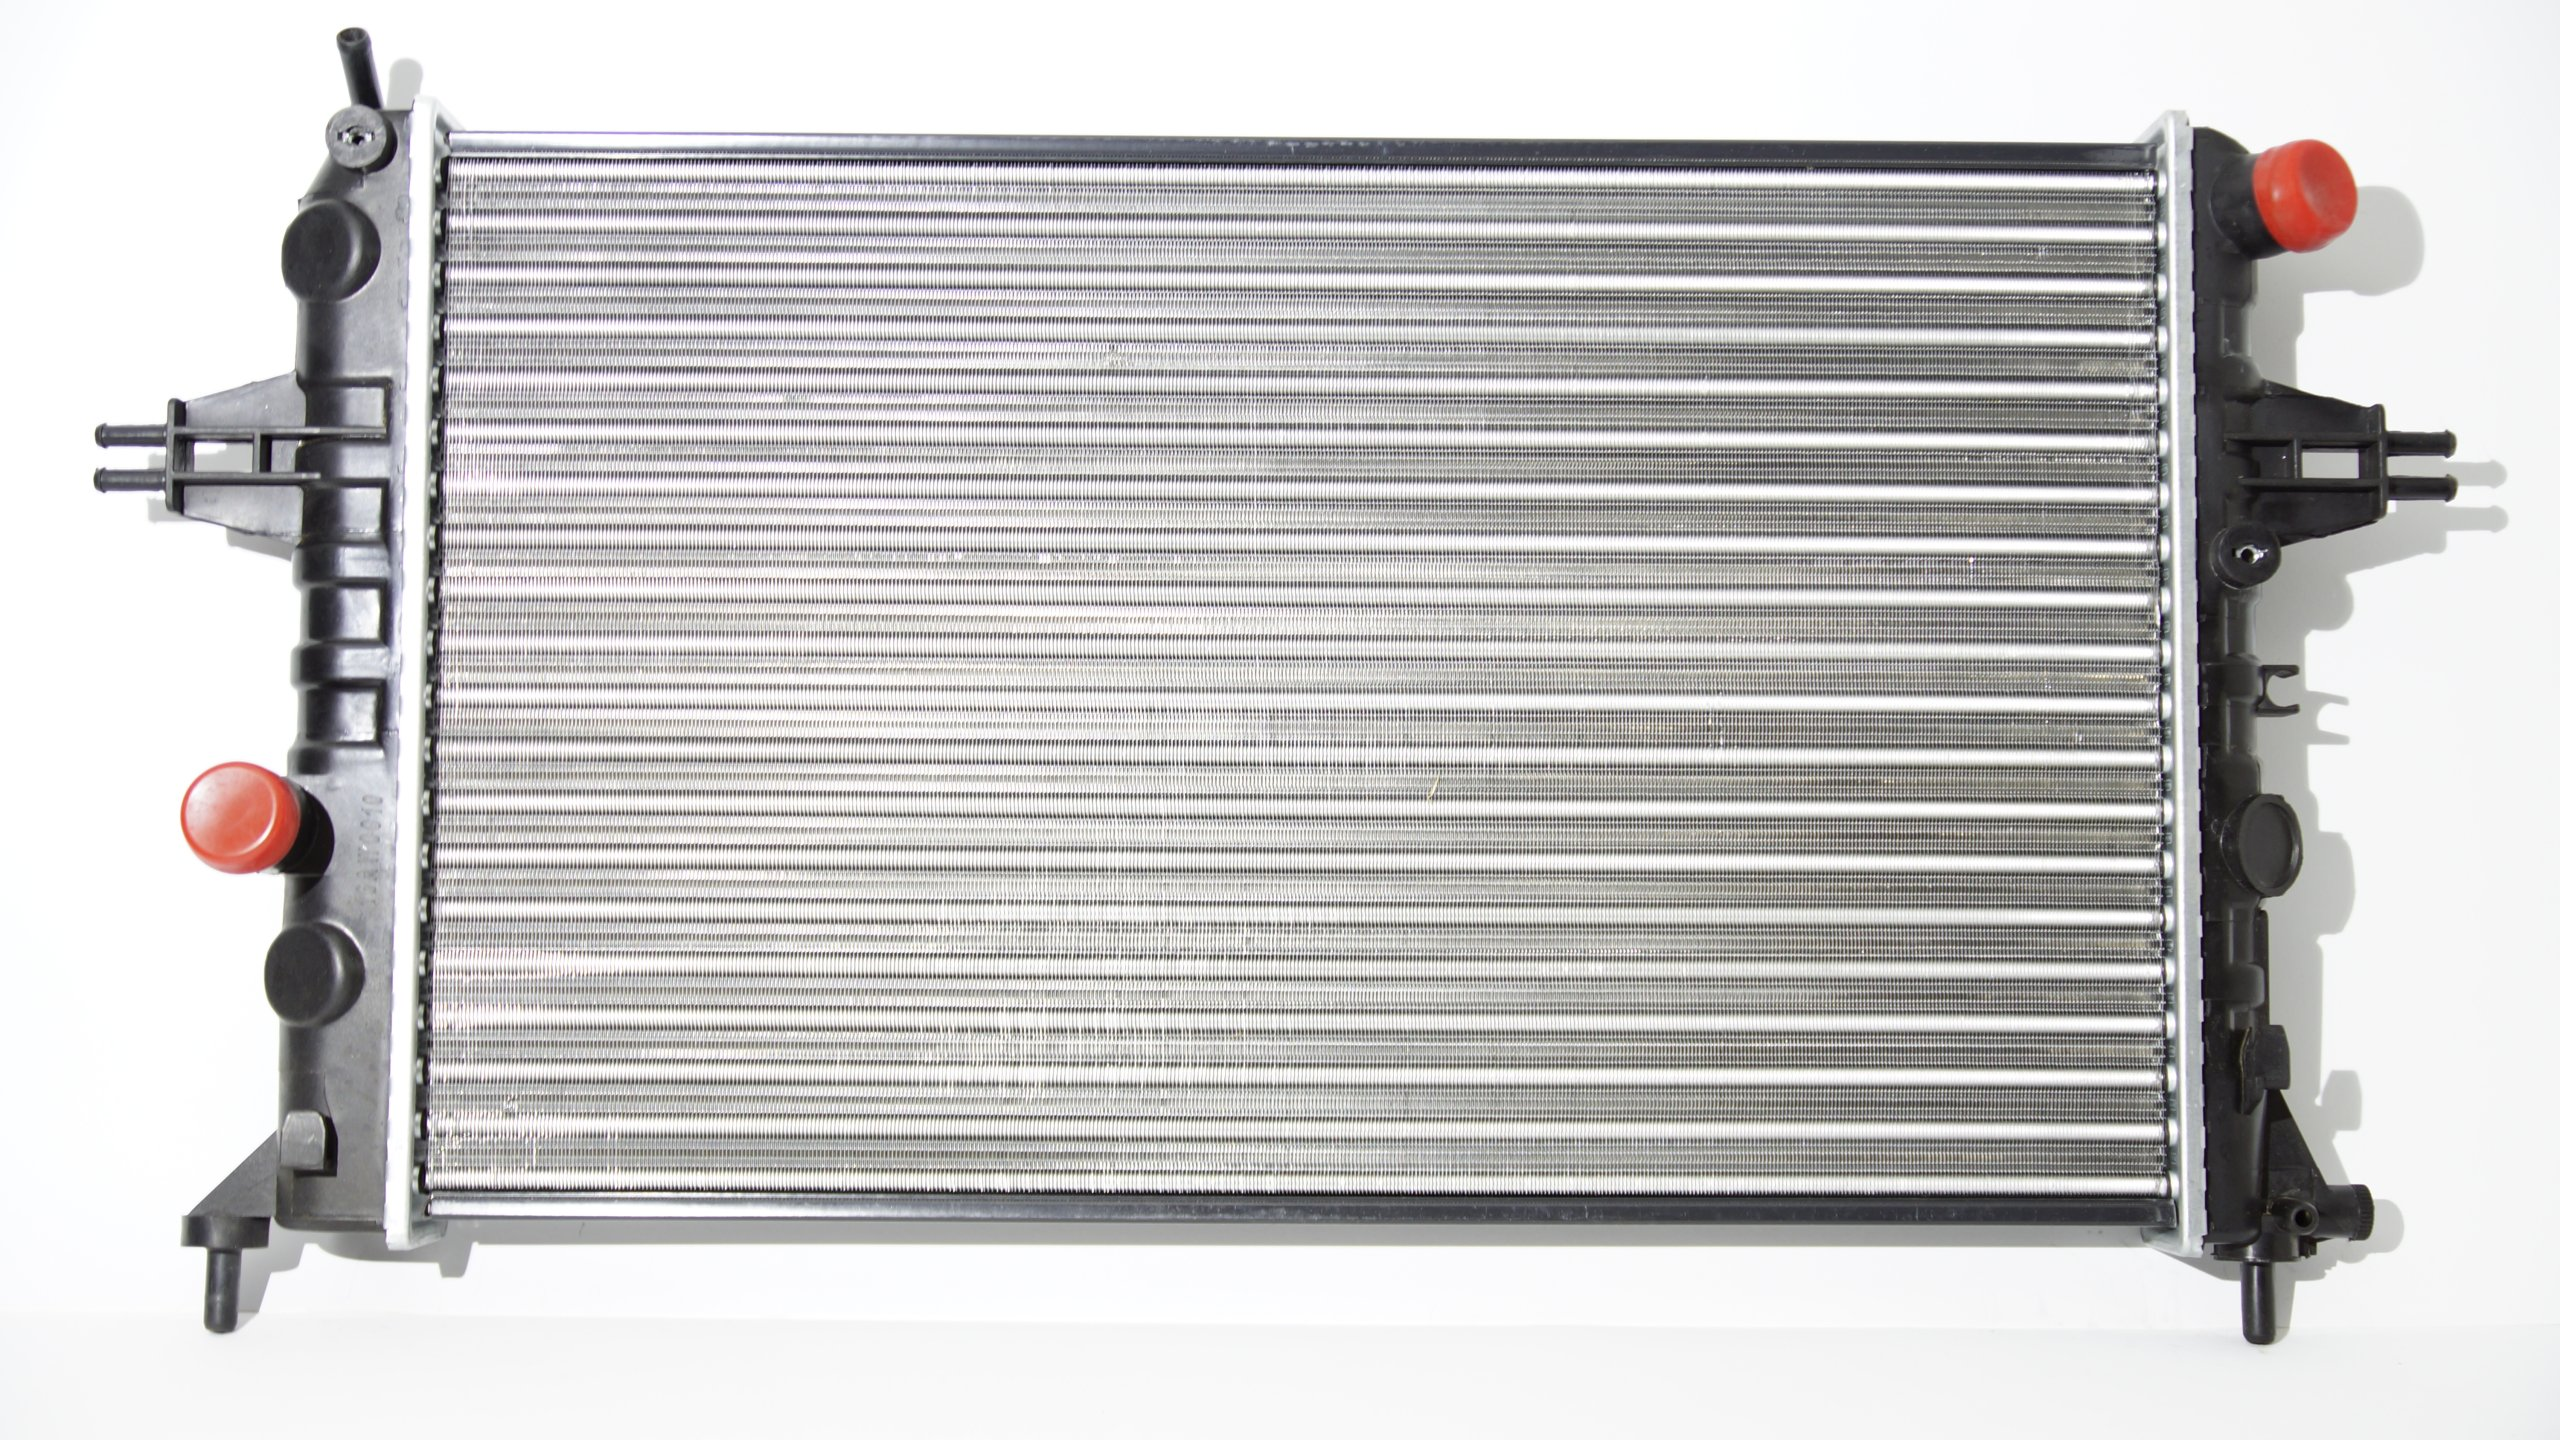 радиатор воды opel astra ii g 1 4 1 6 1 8 + ac